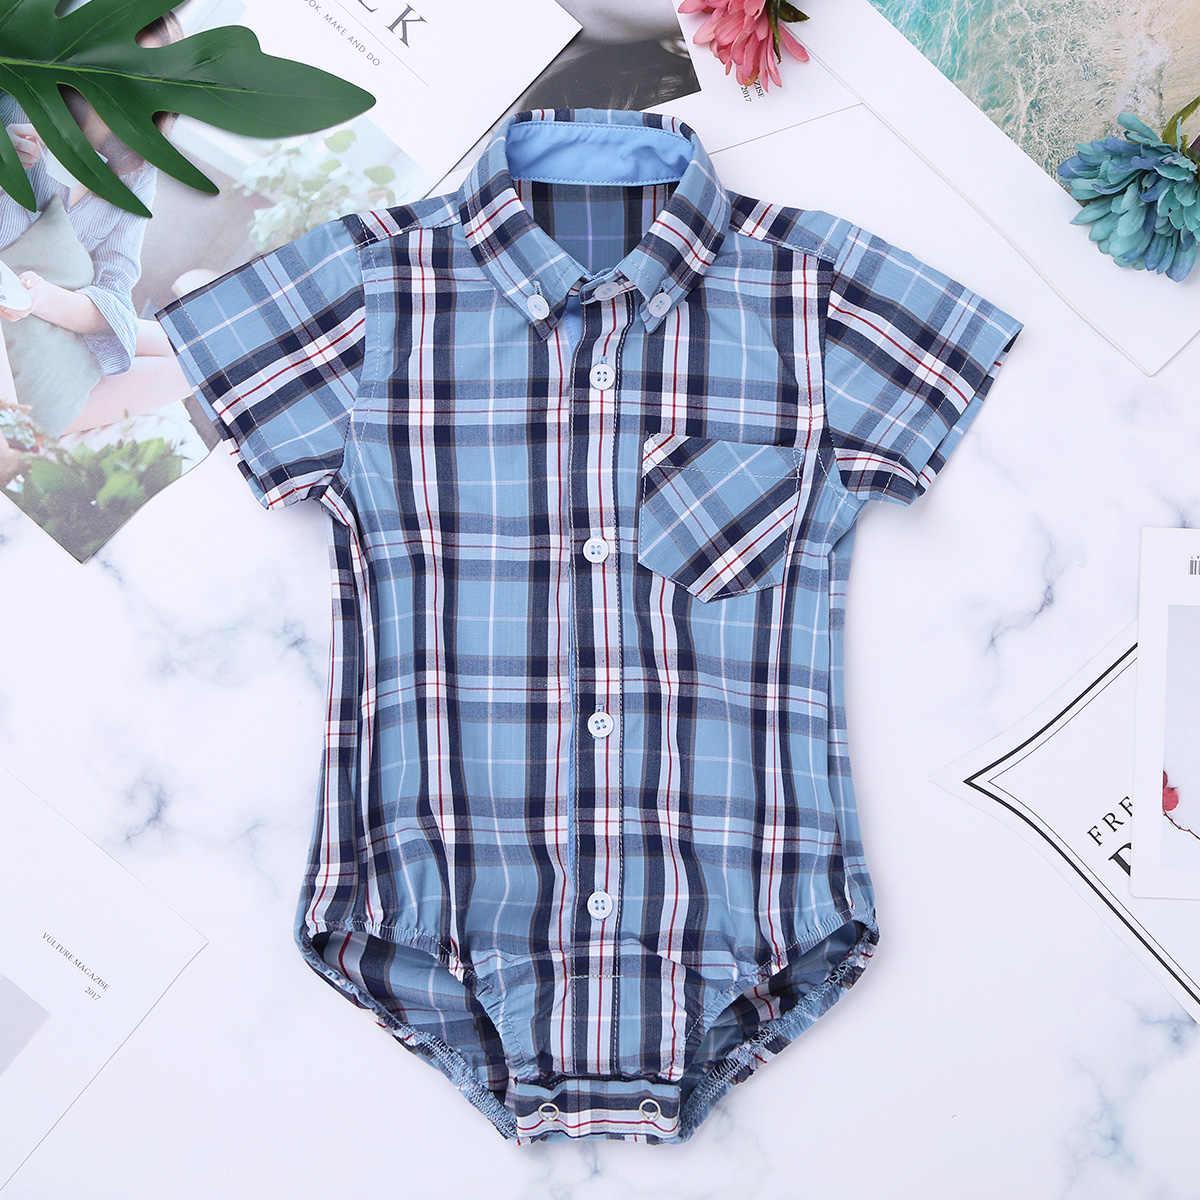 0d3890e5260ee Detail Feedback Questions about Infantil Baby Boys Bodysuit Bebe ...